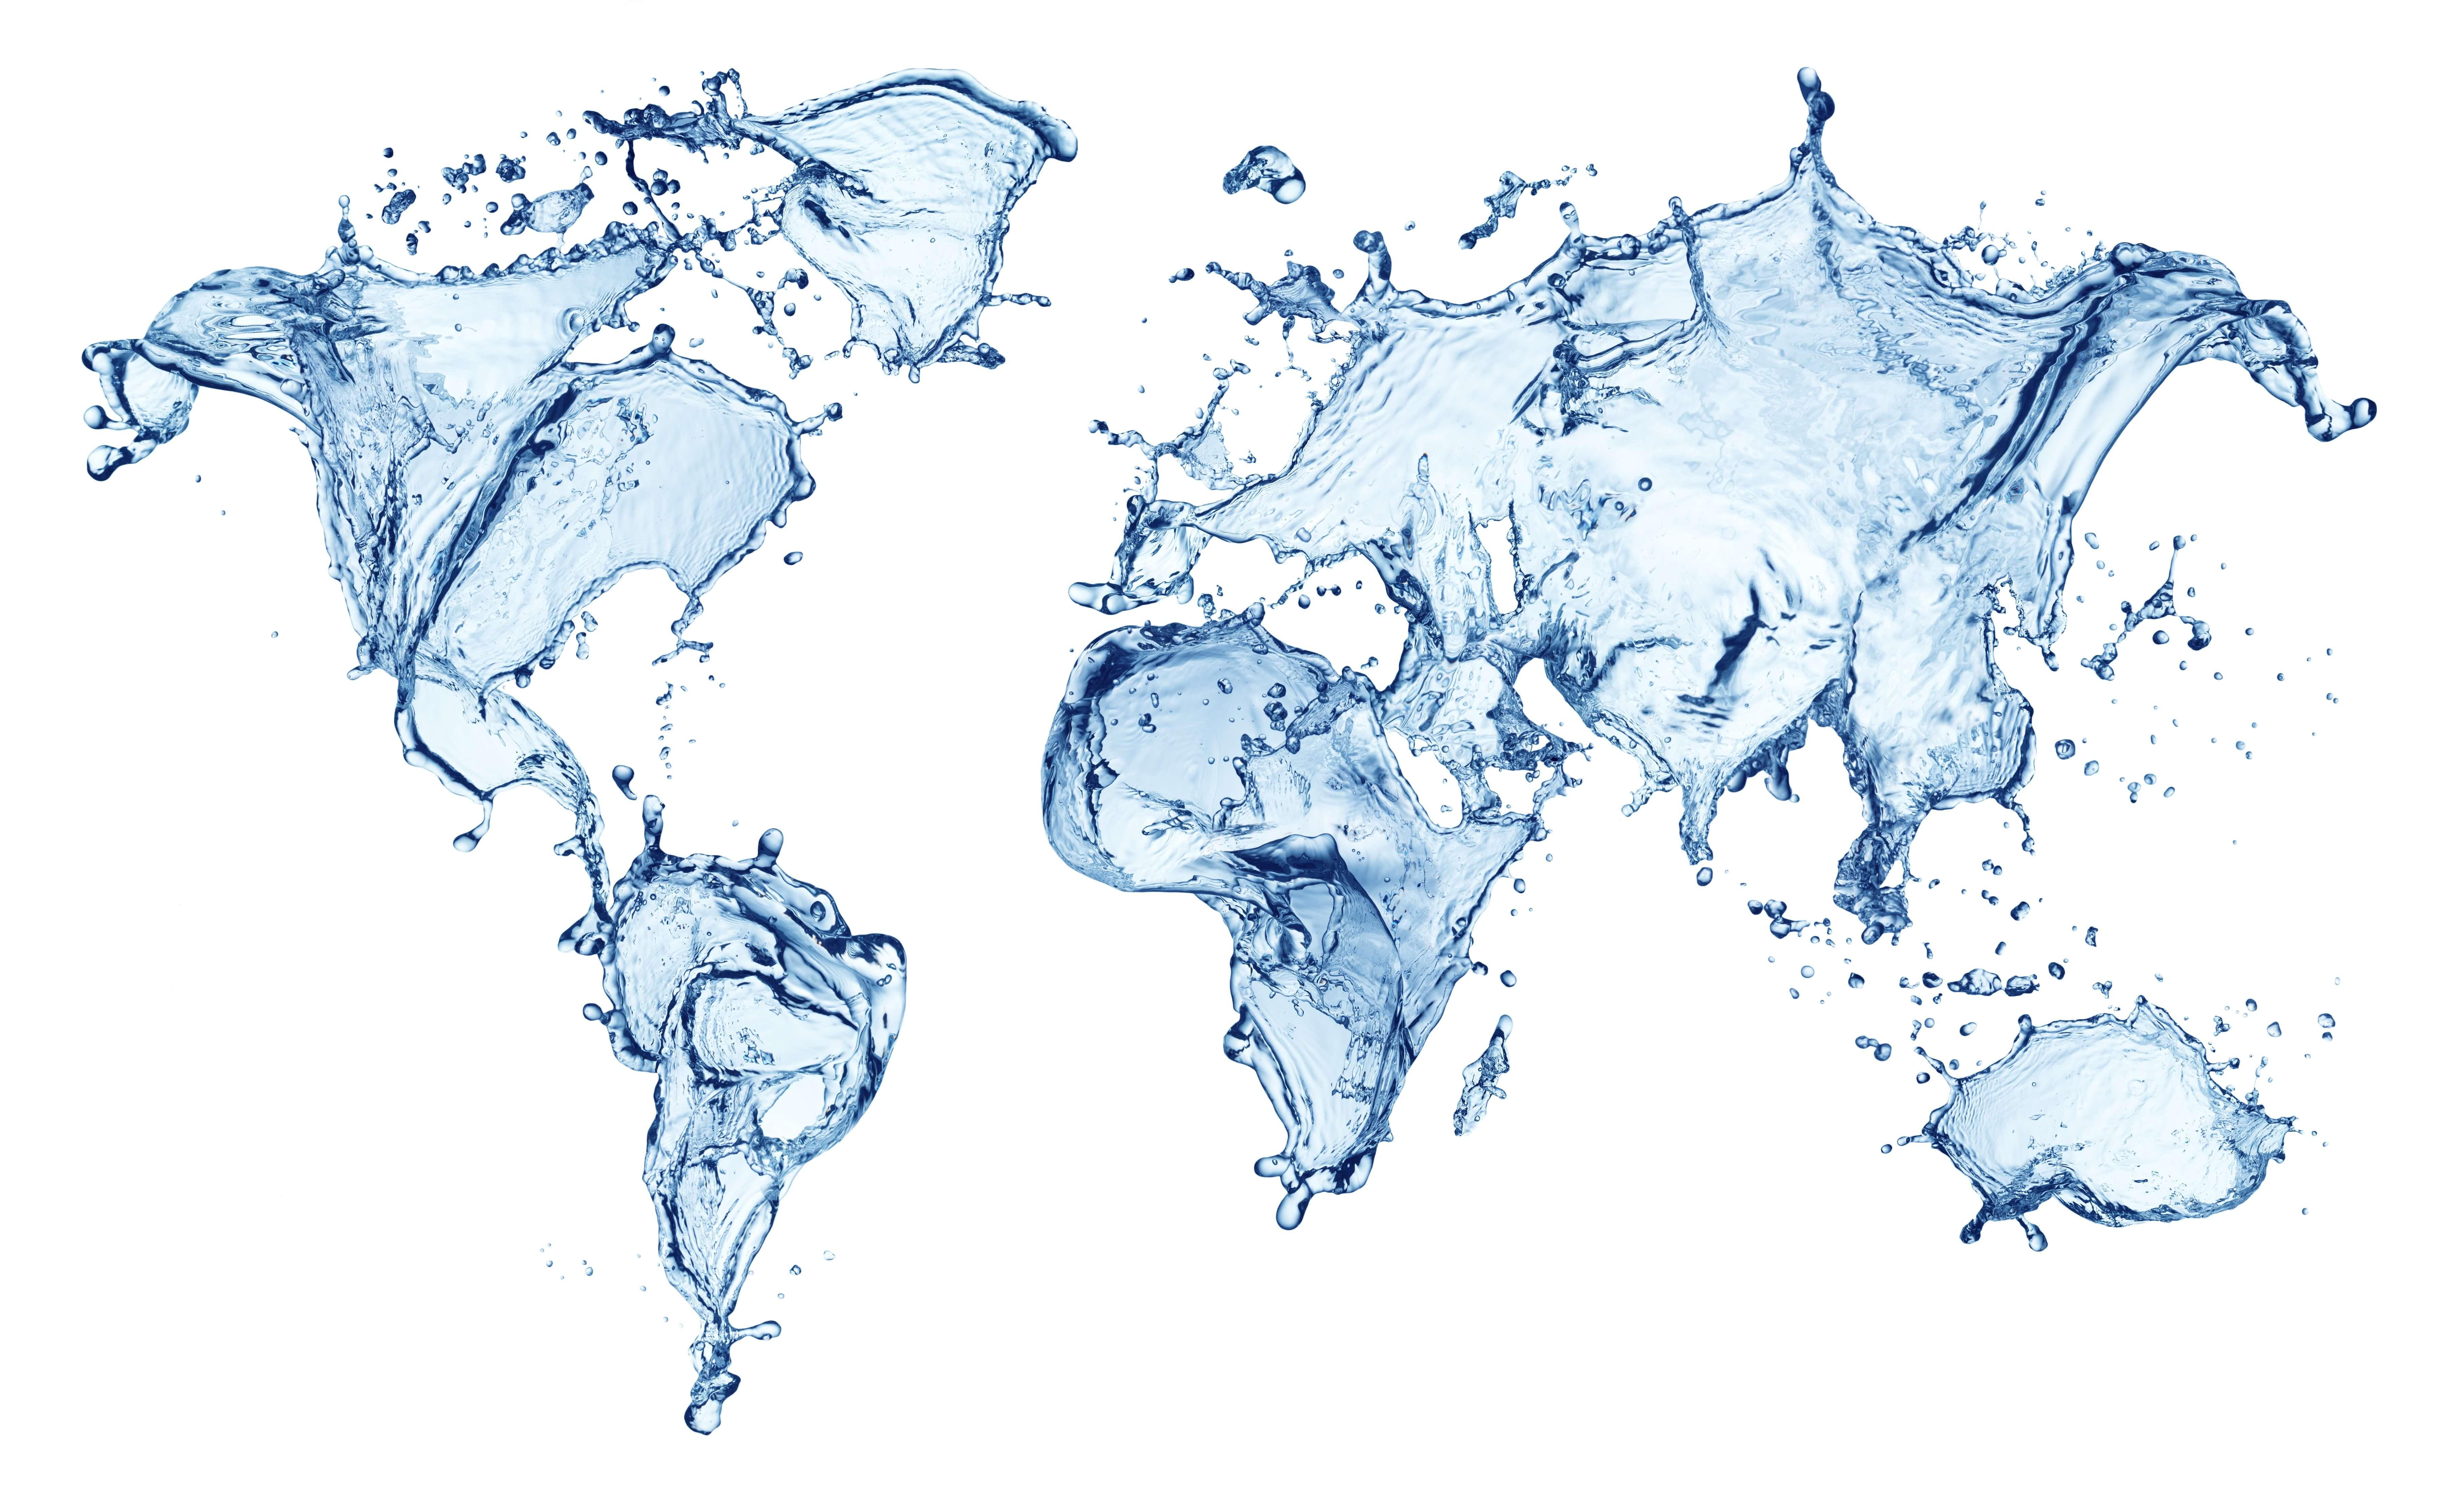 world water day map hd desktop